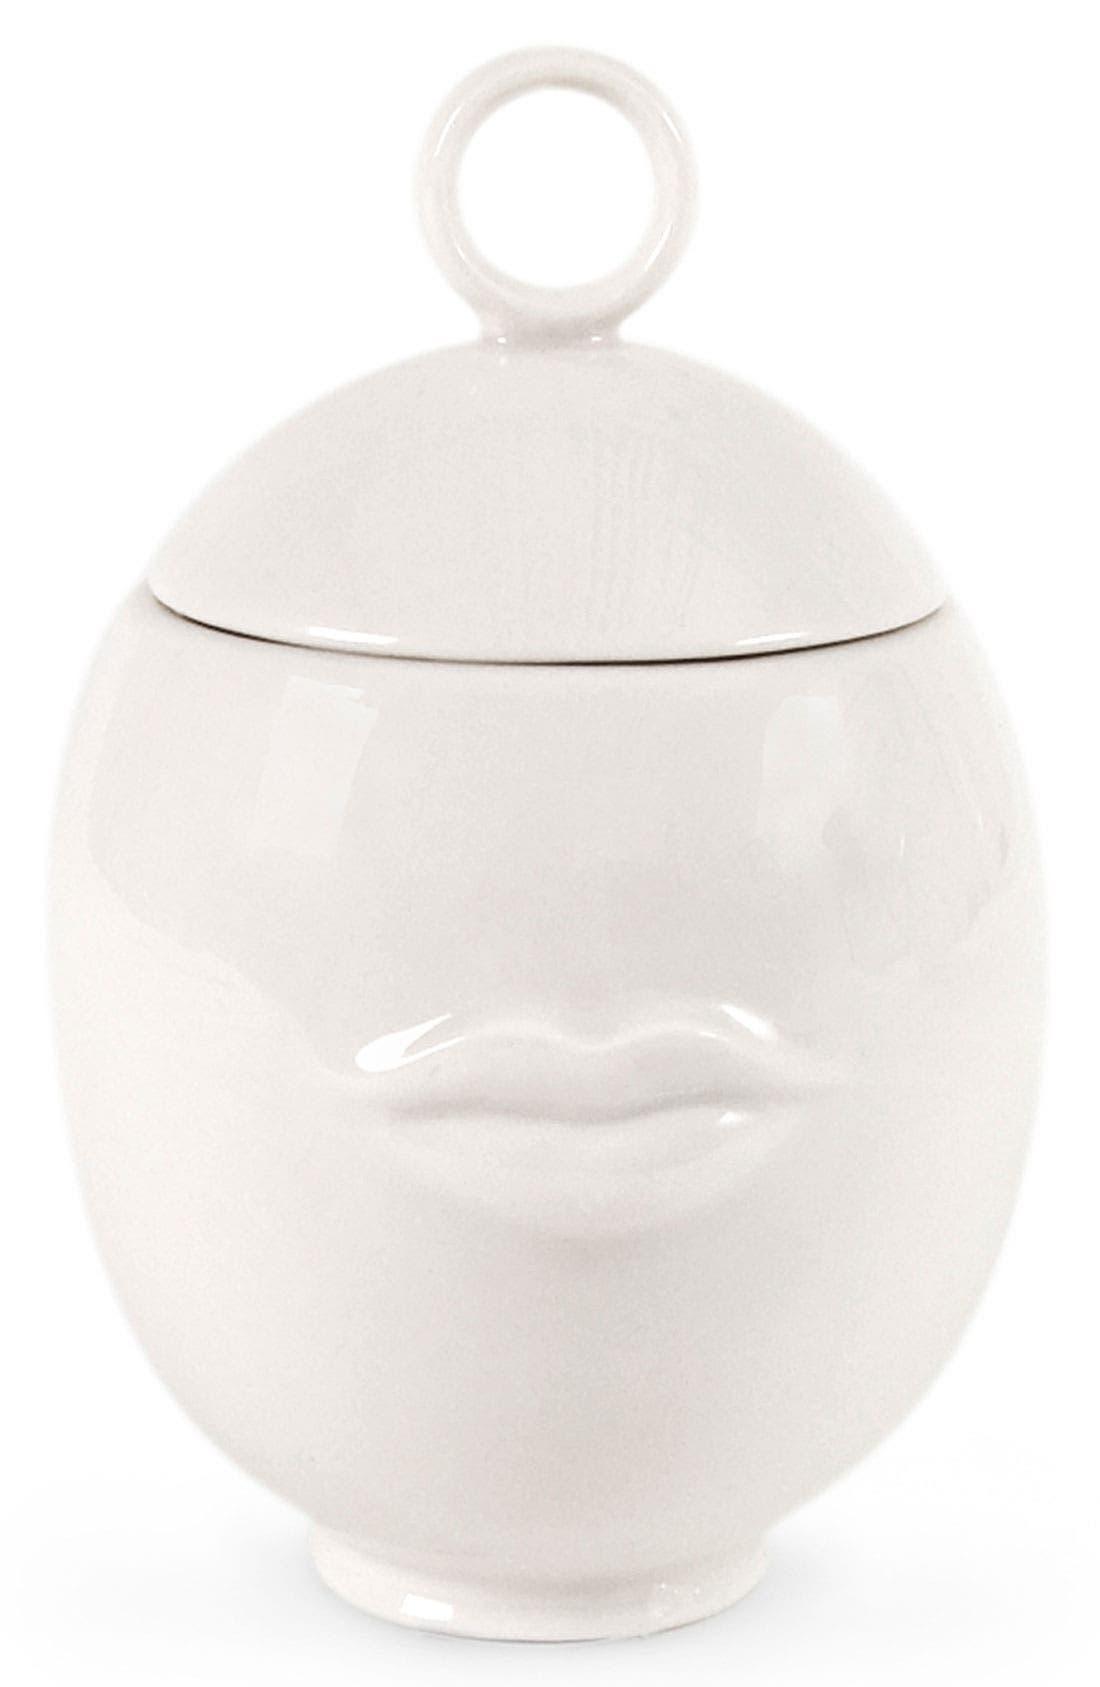 Alternate Image 1 Selected - Jonathan Adler 'Muse' Porcelain Sugar Bowl